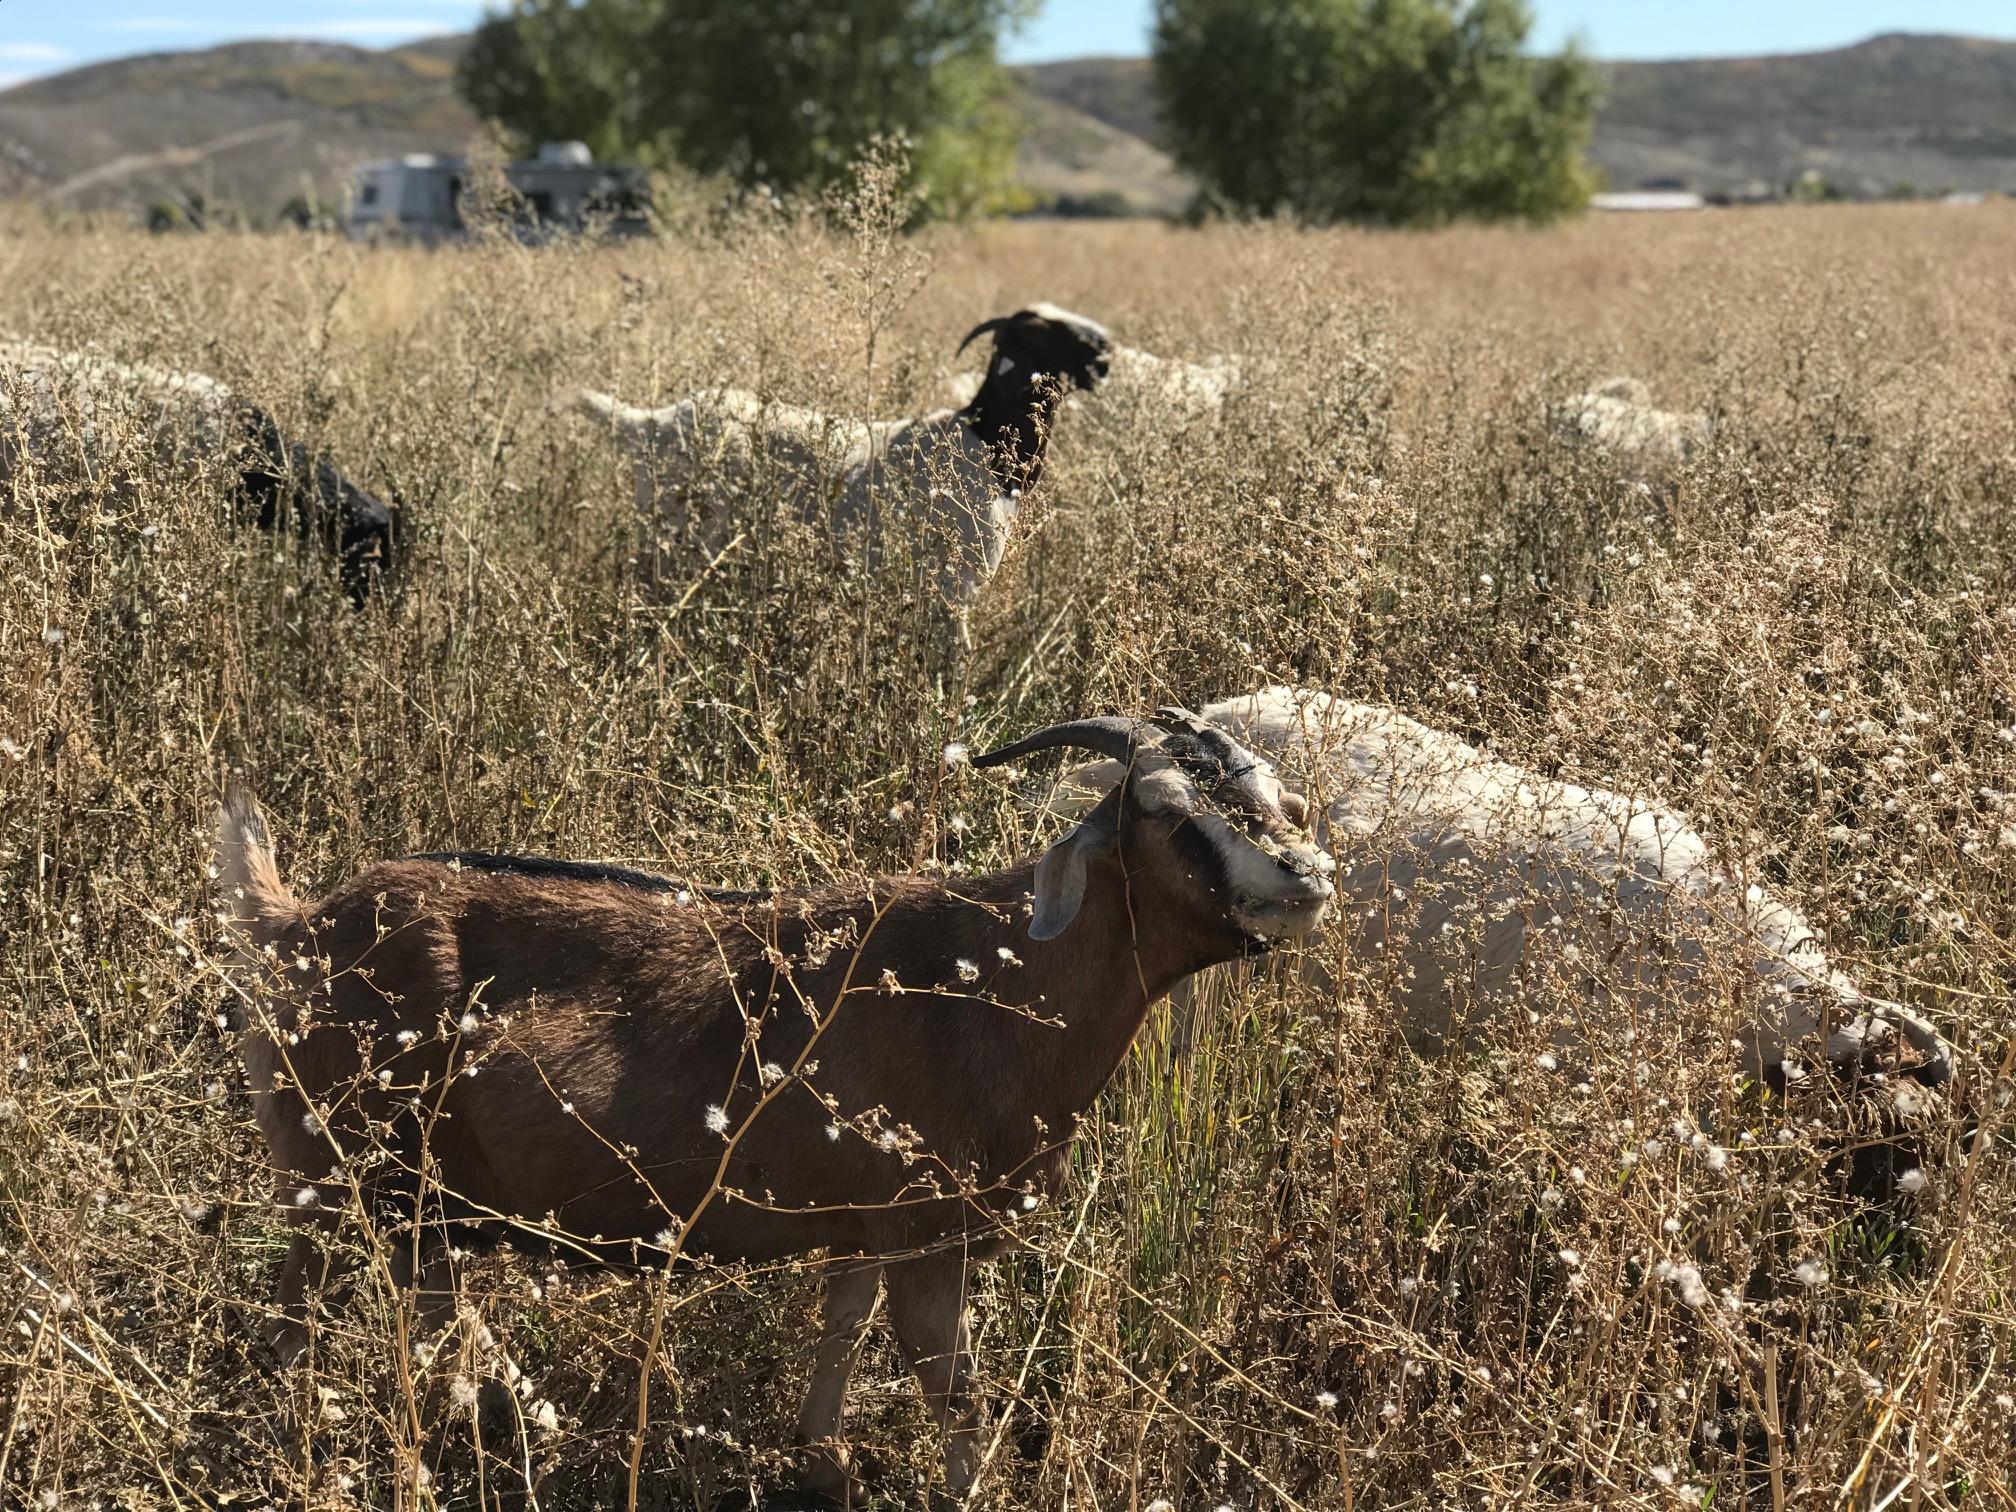 Sheep standing in tall grass